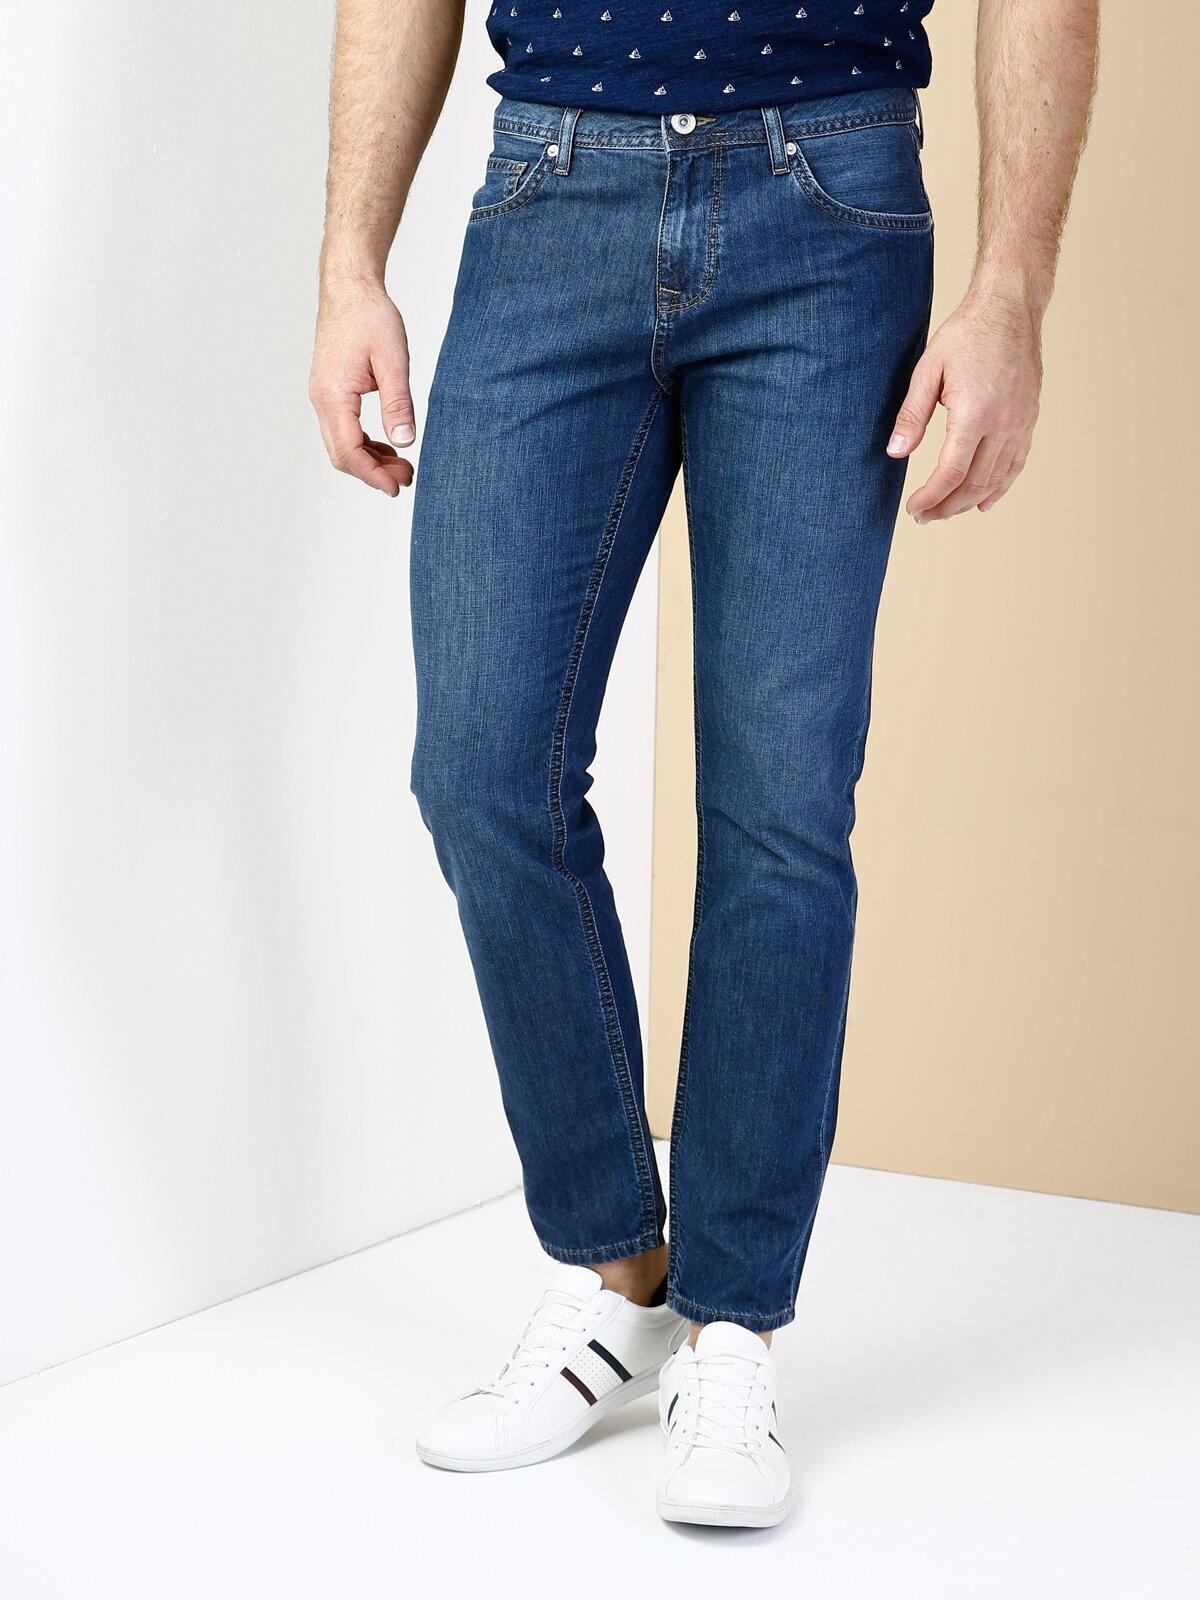 044 Karl Düşük Bel Düz Paça Straight Fit Mavi Erkek Jean Pantolon